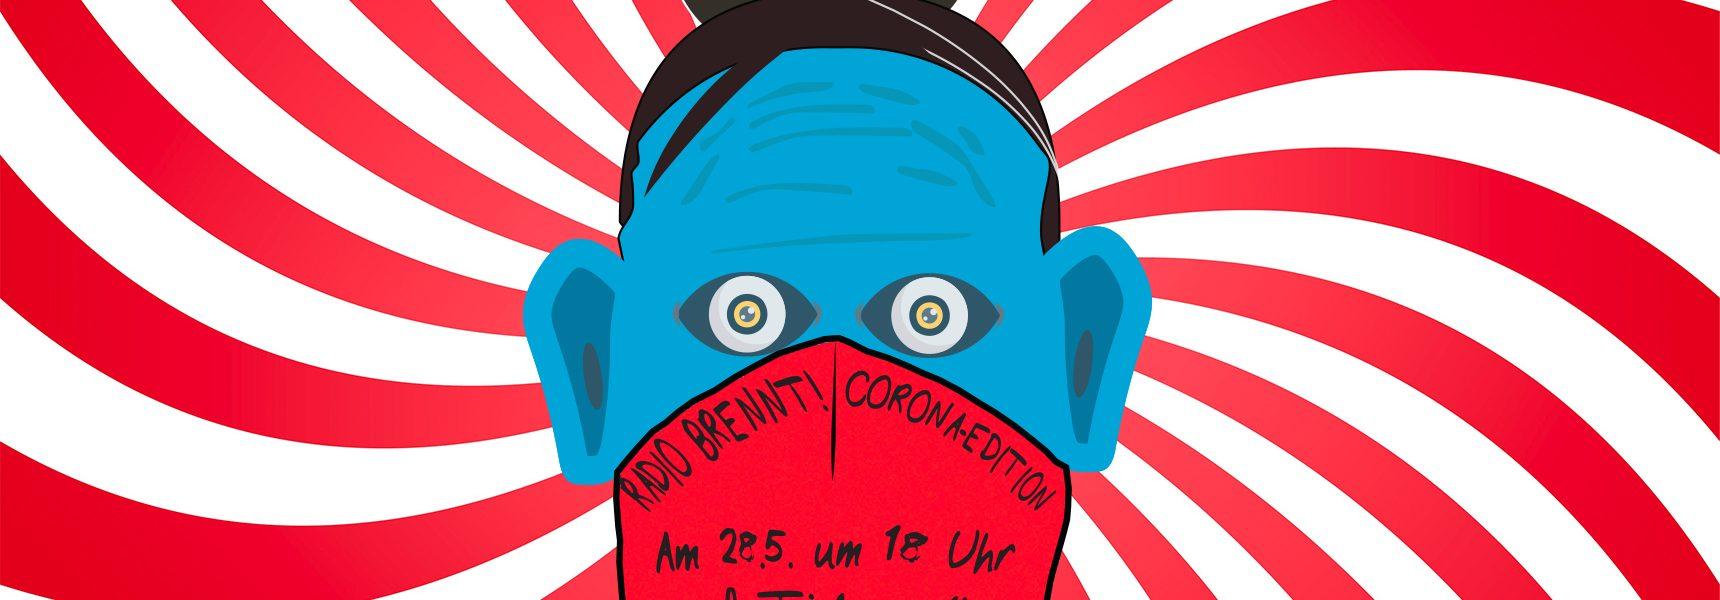 Radio Brennt! Corona Edition